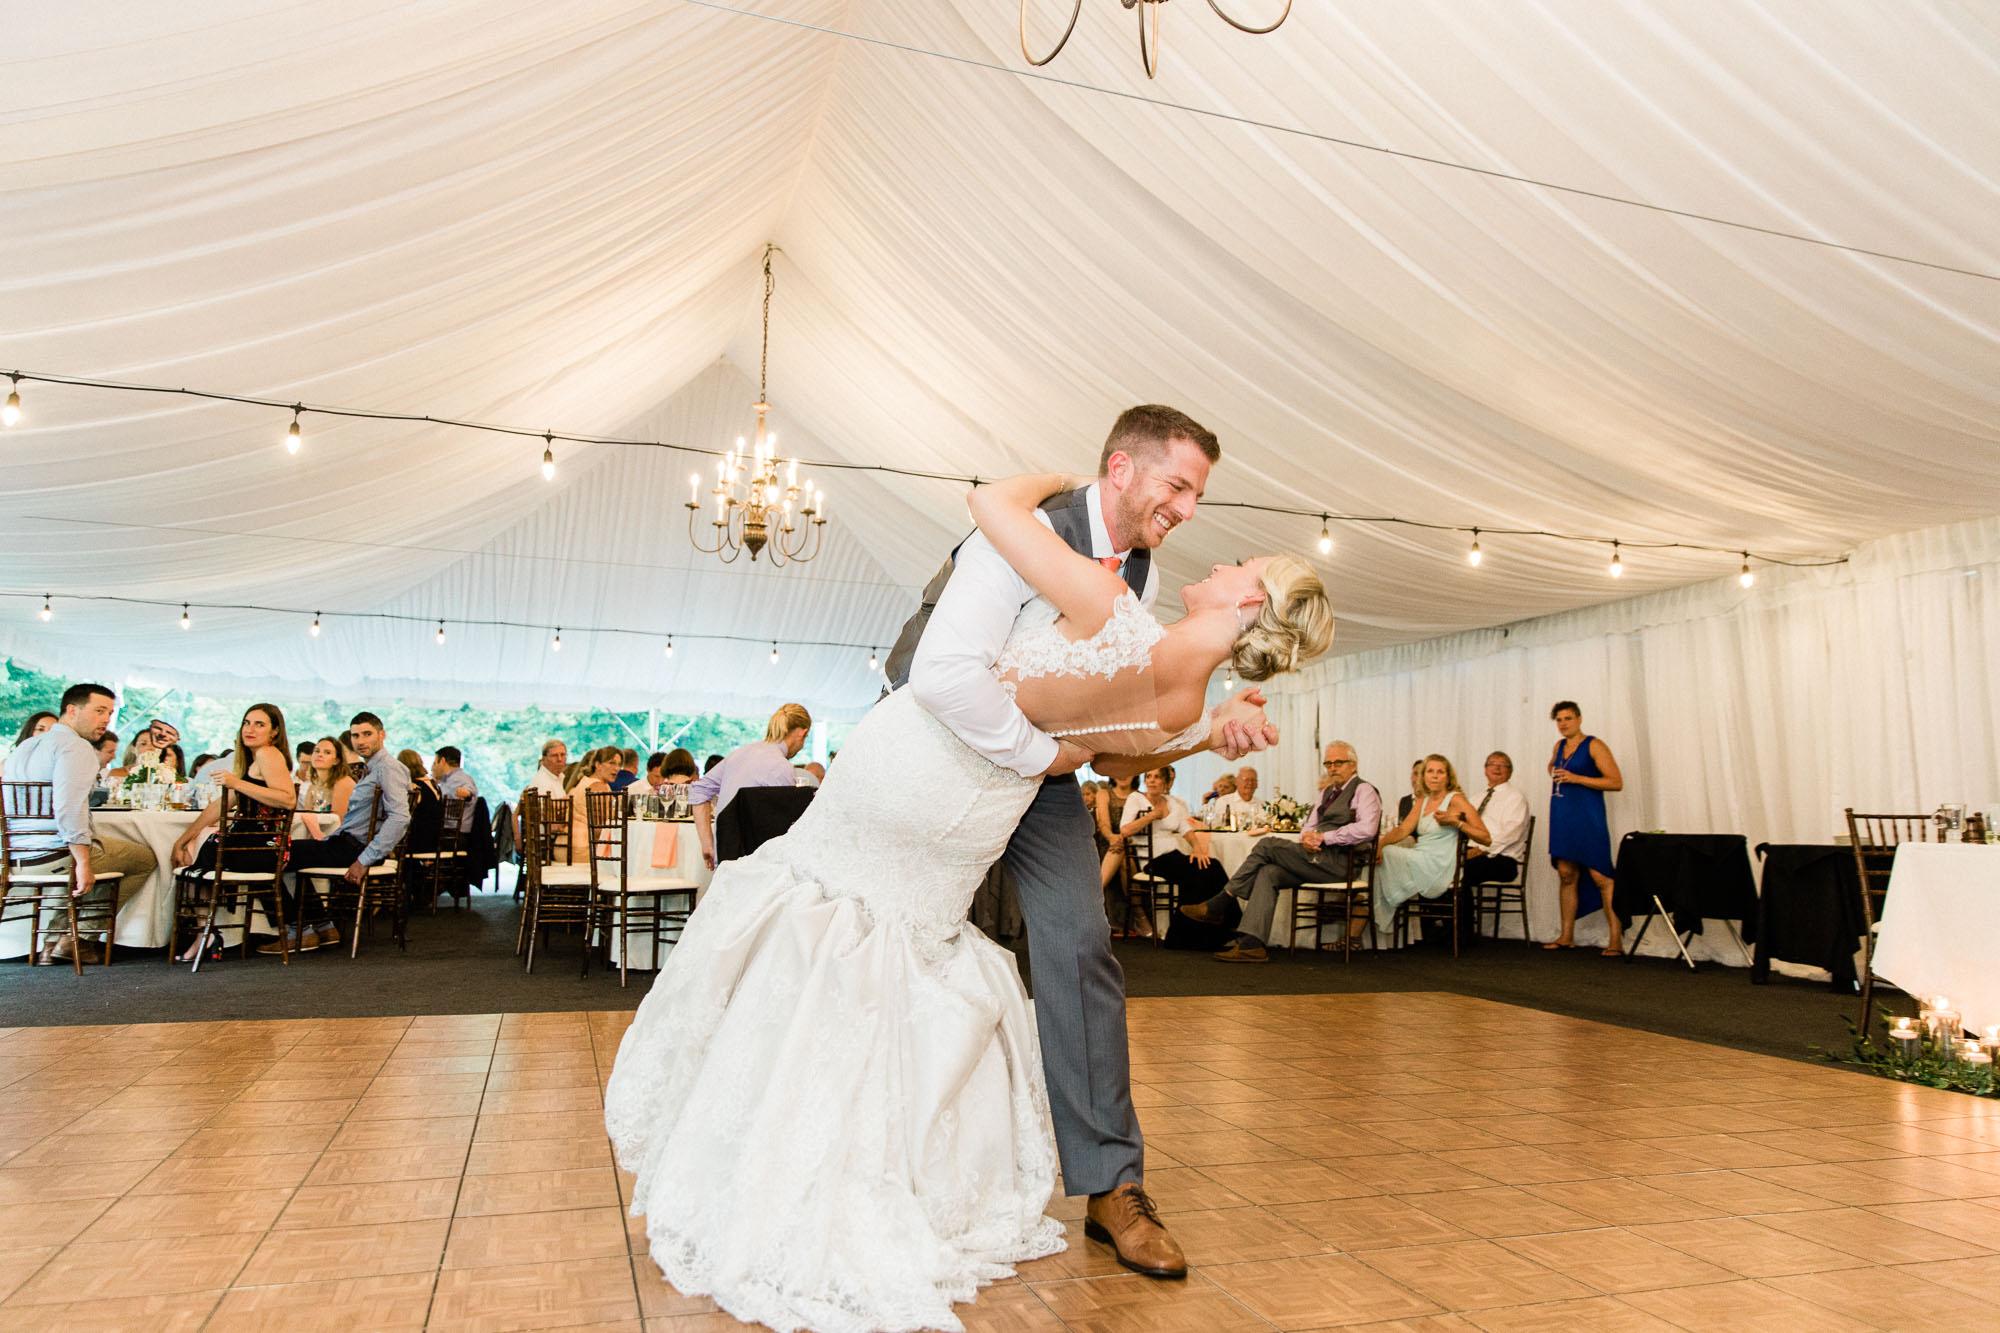 Allenberry-resort-historic-pennsylvania-wedding-10473.jpg